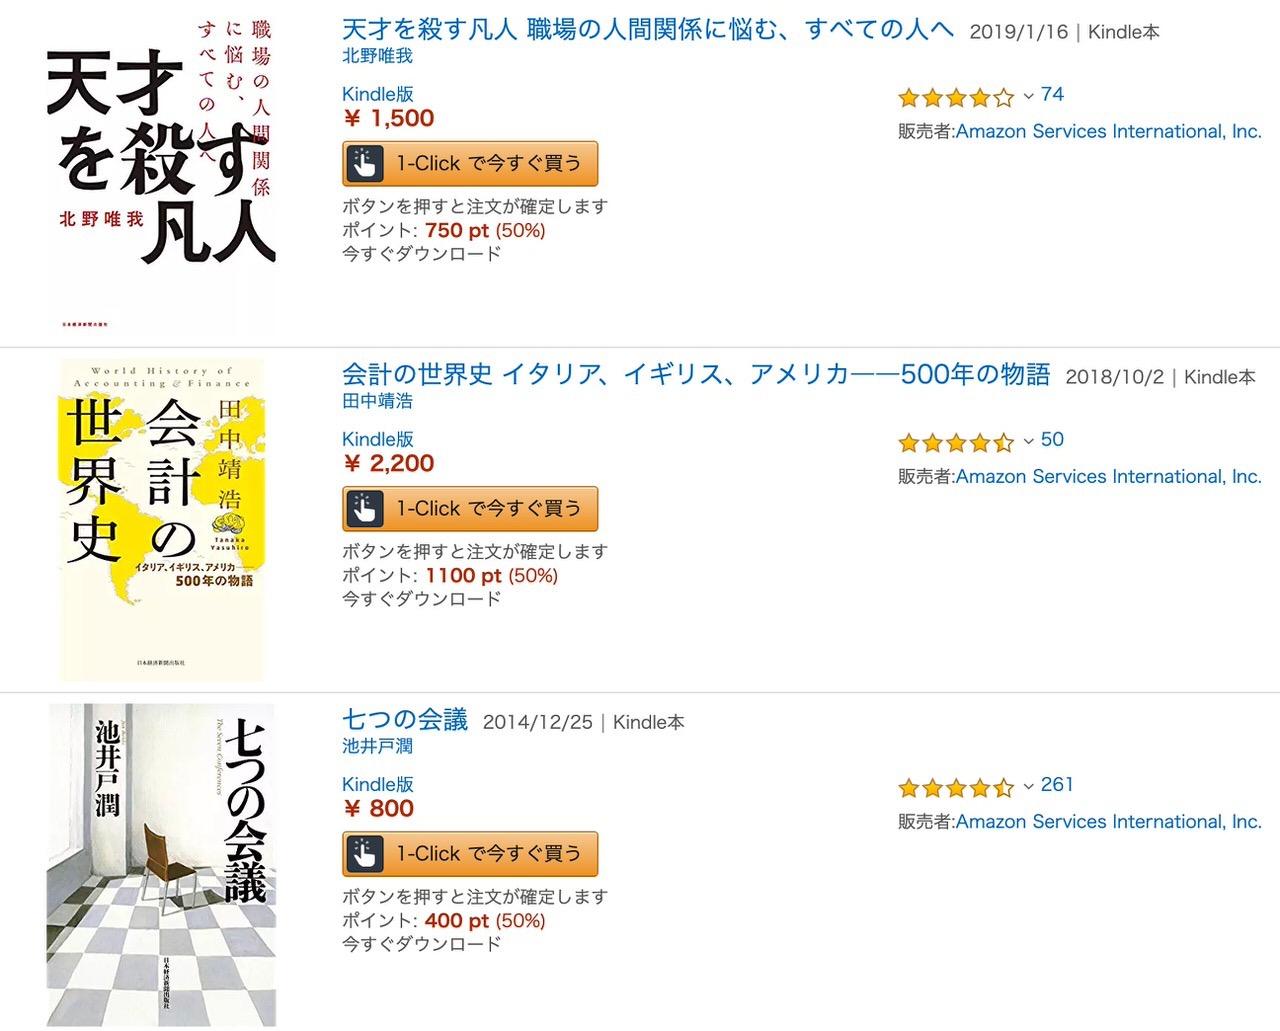 【Kindleセール】50%ポイント還元!900冊以上が対象「日本経済新聞出版社 春の大型キャンペーン」開催中(4/25まで)